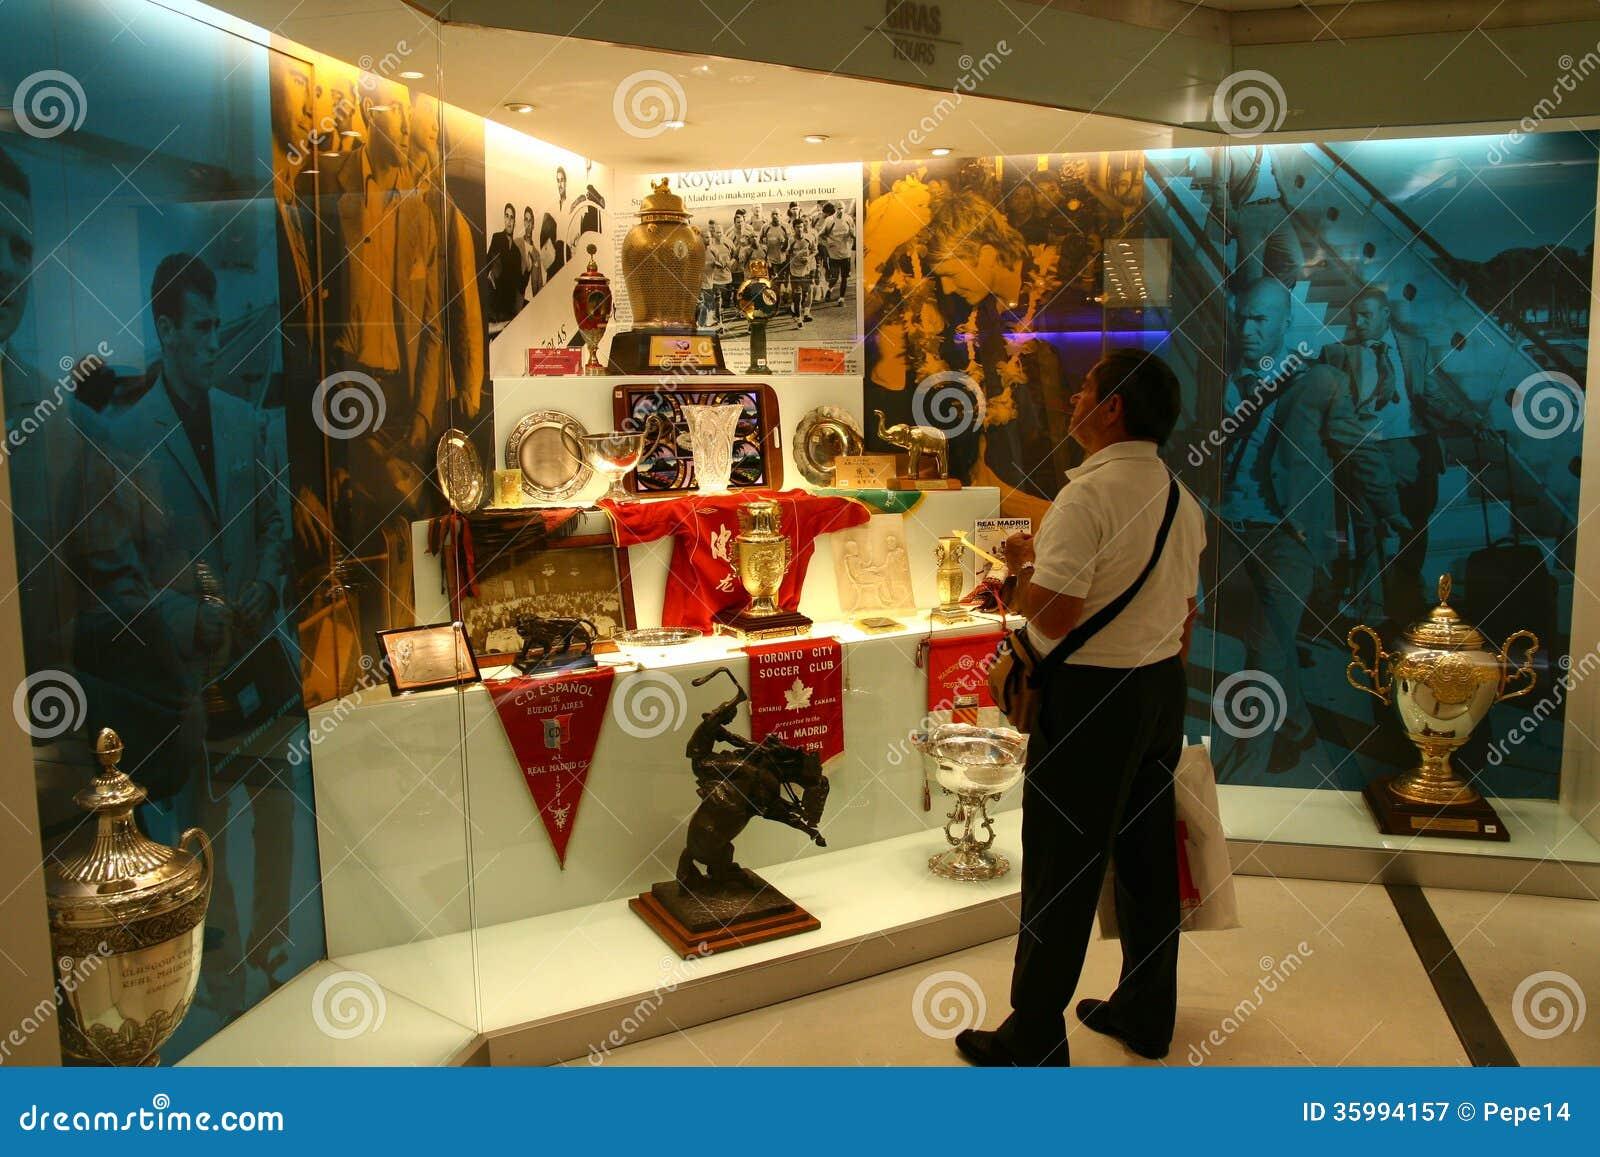 Fan admiring football cups